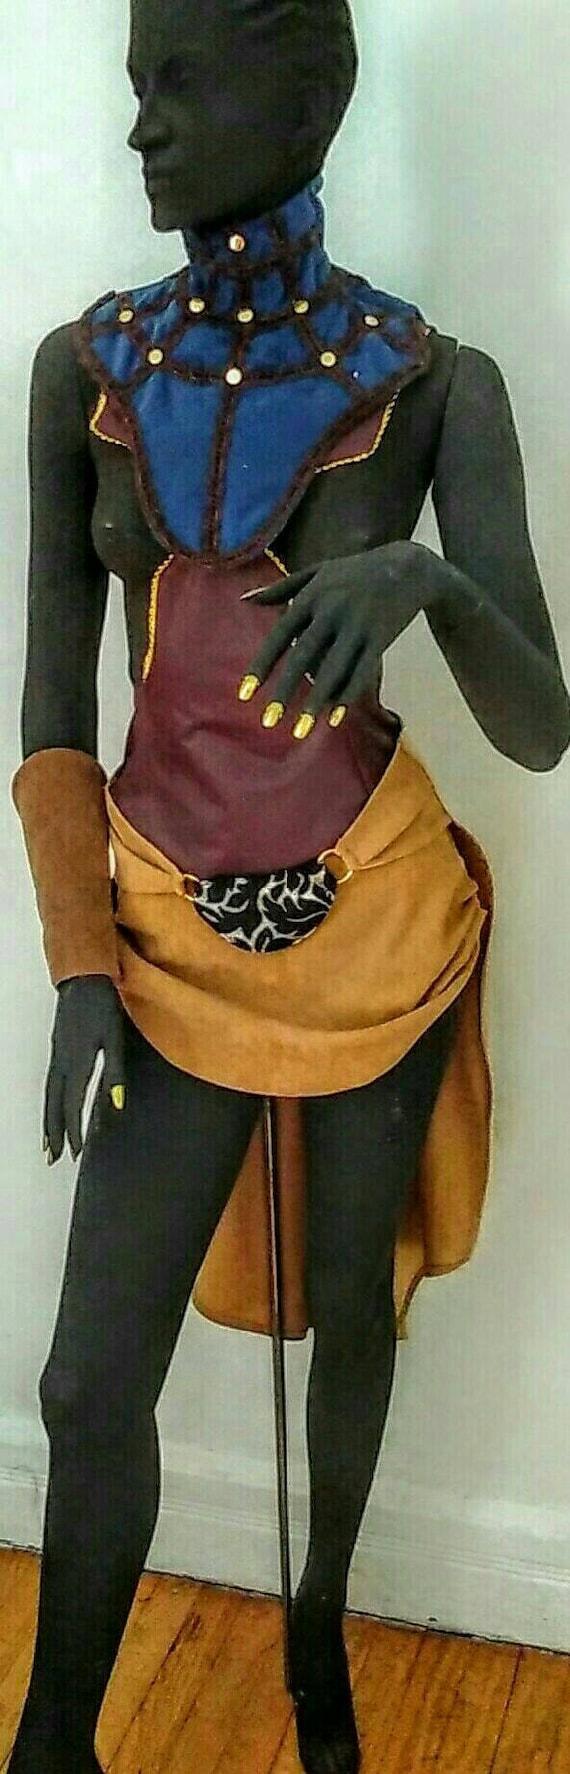 COSPLAYING SHURI CHARACTER - 6pc - Black Panther Character - Dora Milaje